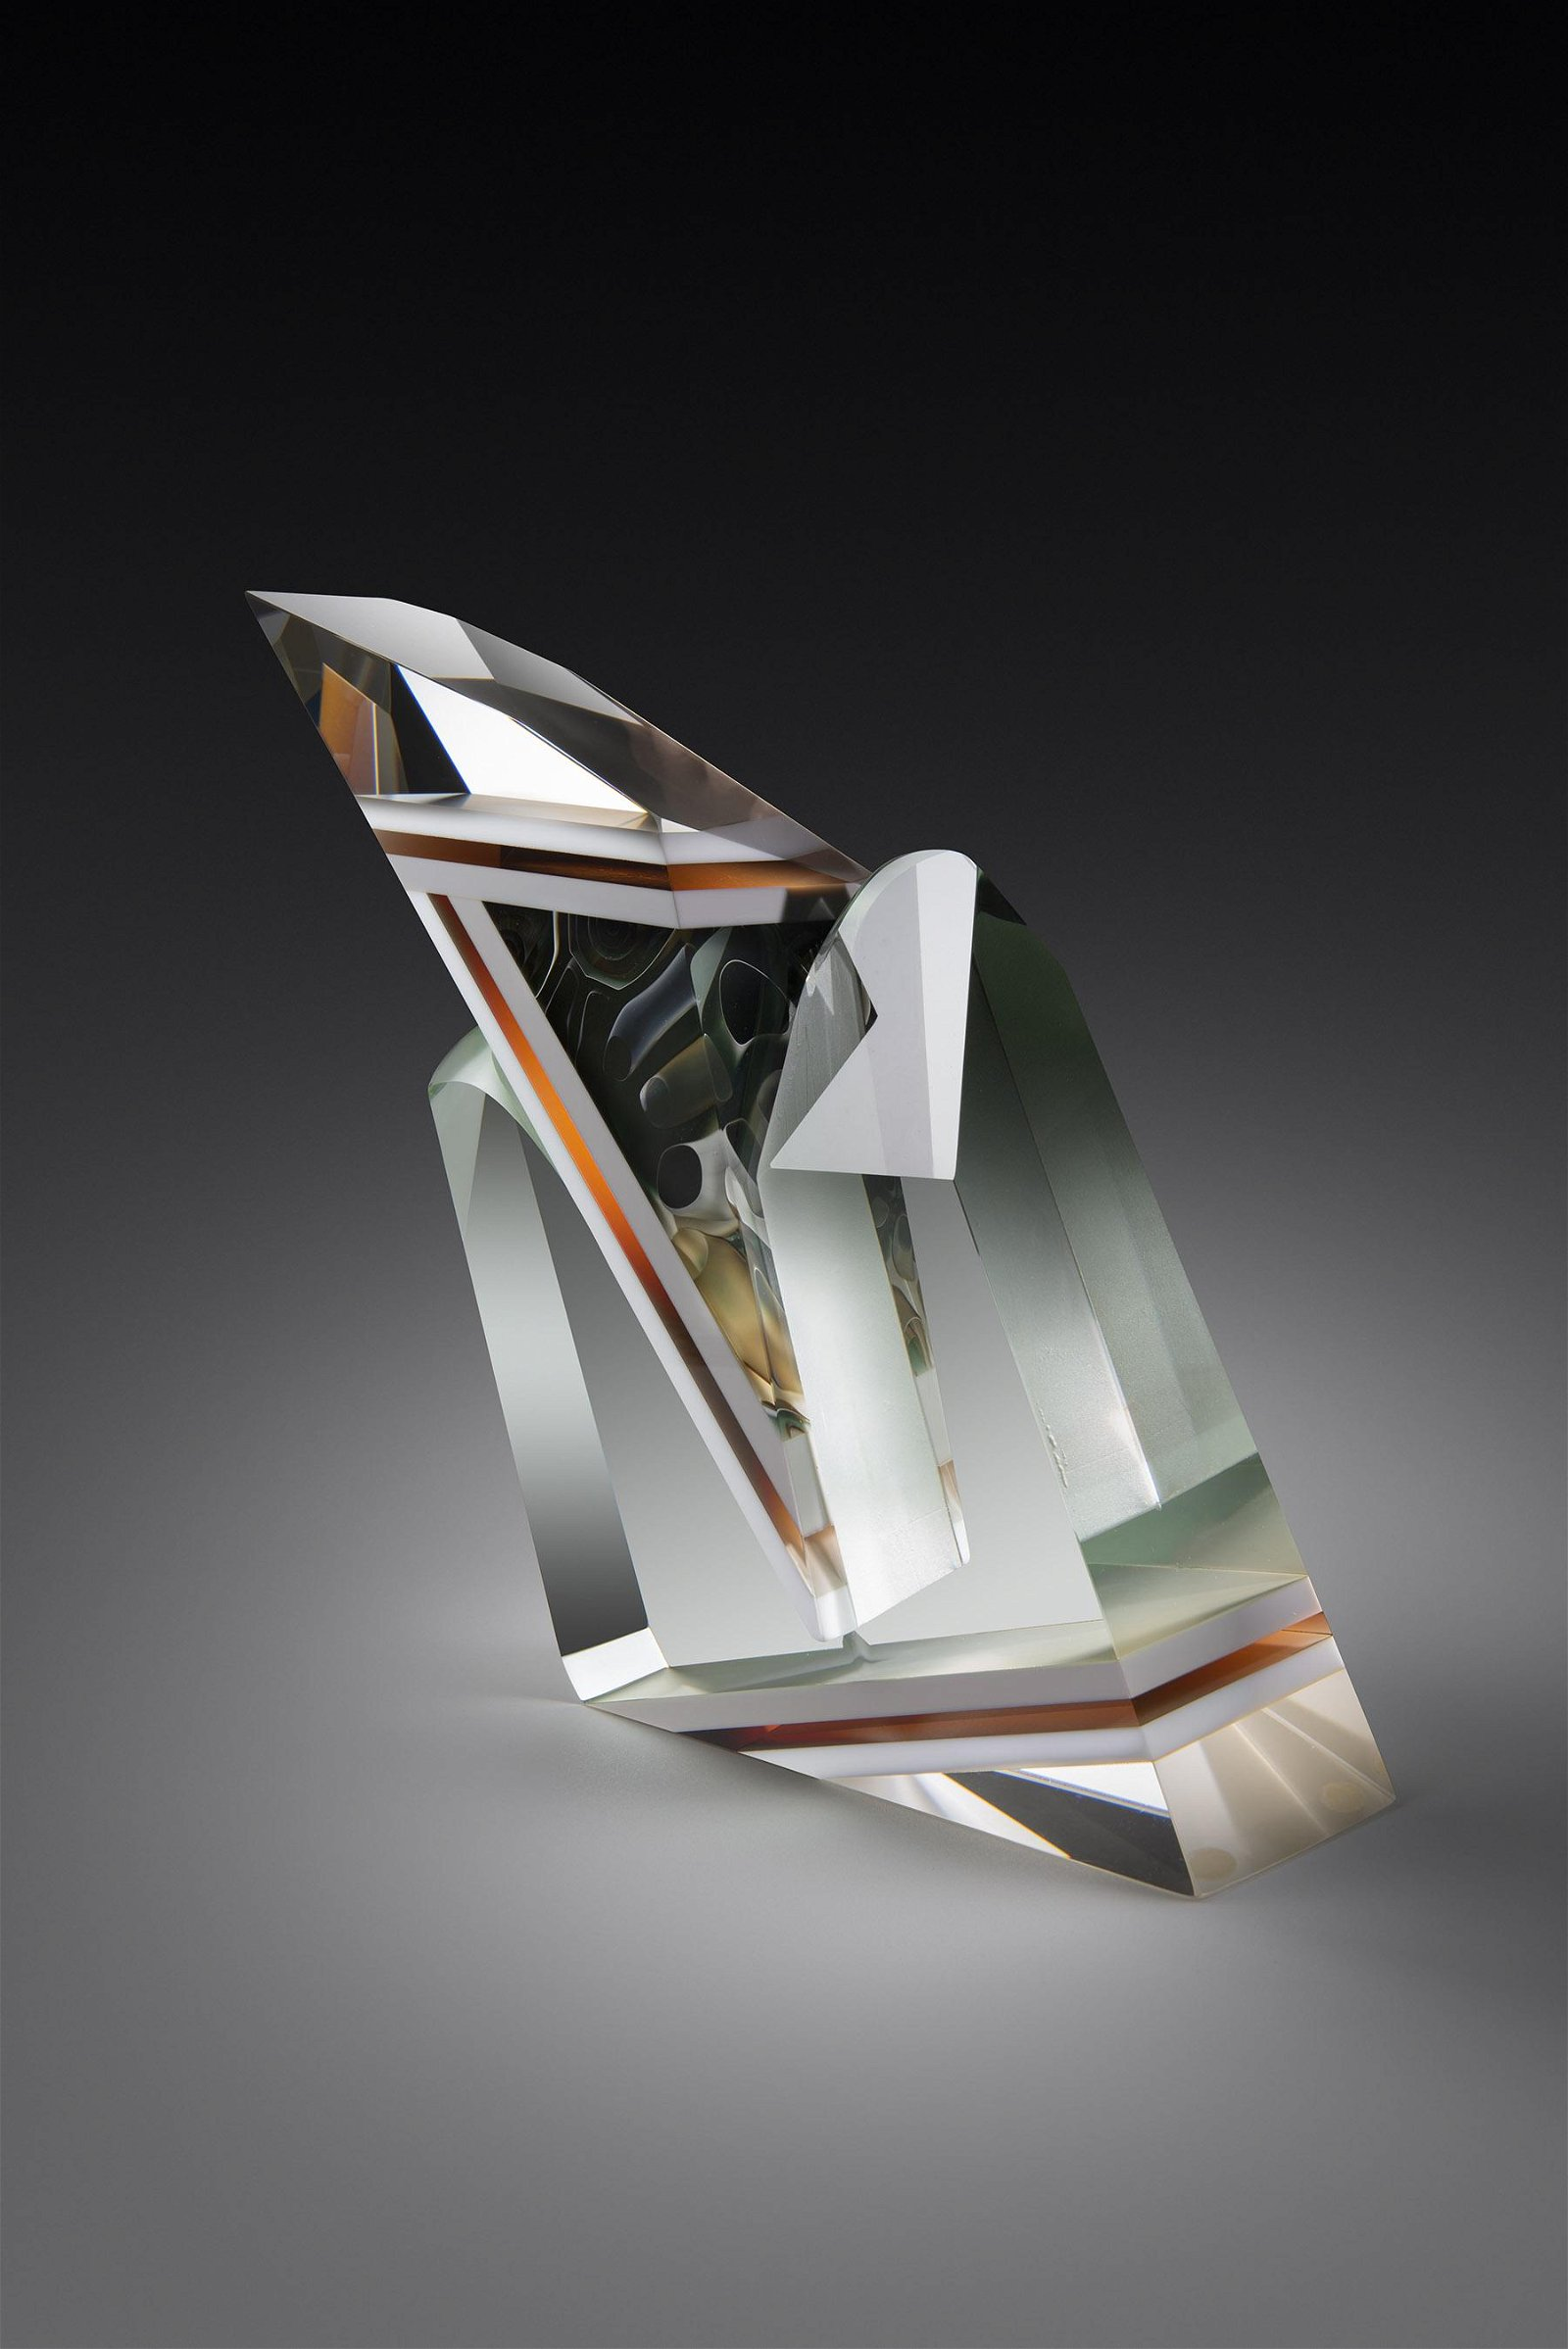 William Carlson Untitled 1981 Art Glass Habatat